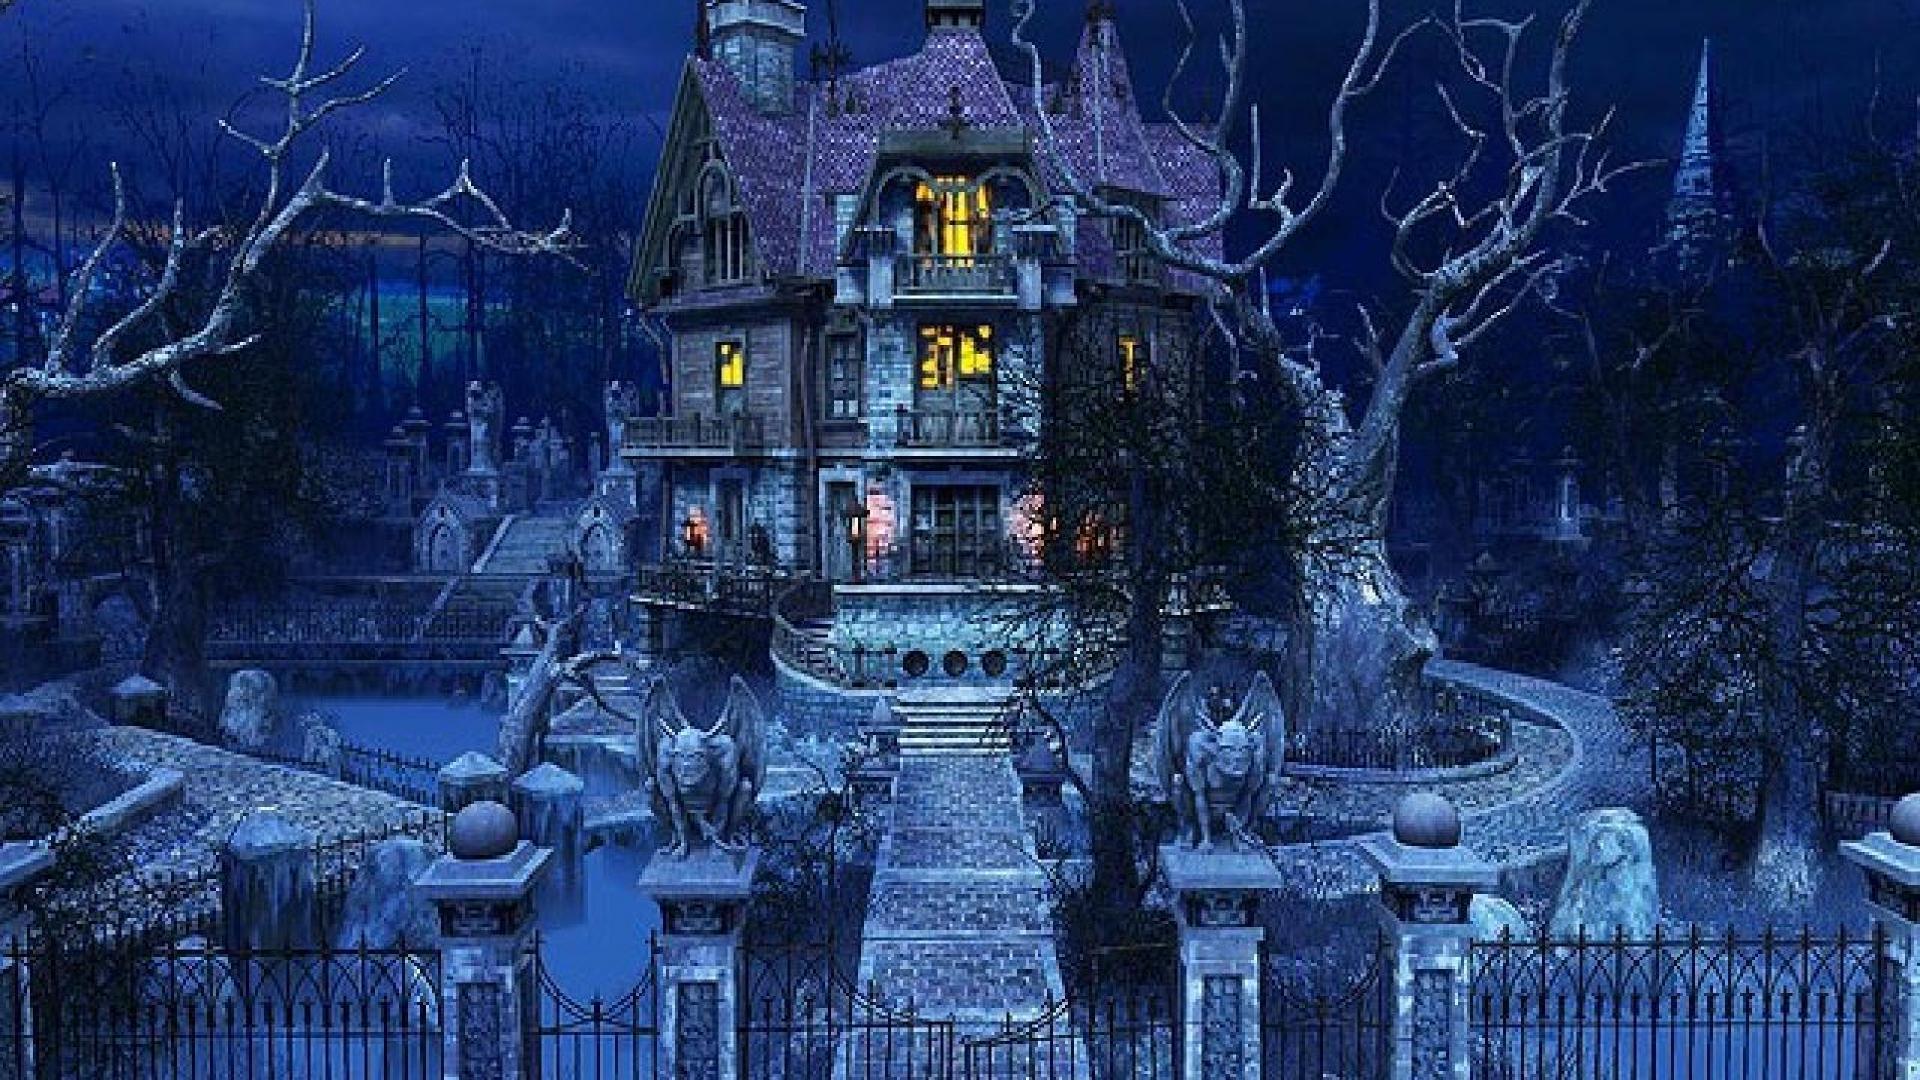 Wonderful Wallpaper Halloween Haunted - CEj2wn  Best Photo Reference_511429.jpg